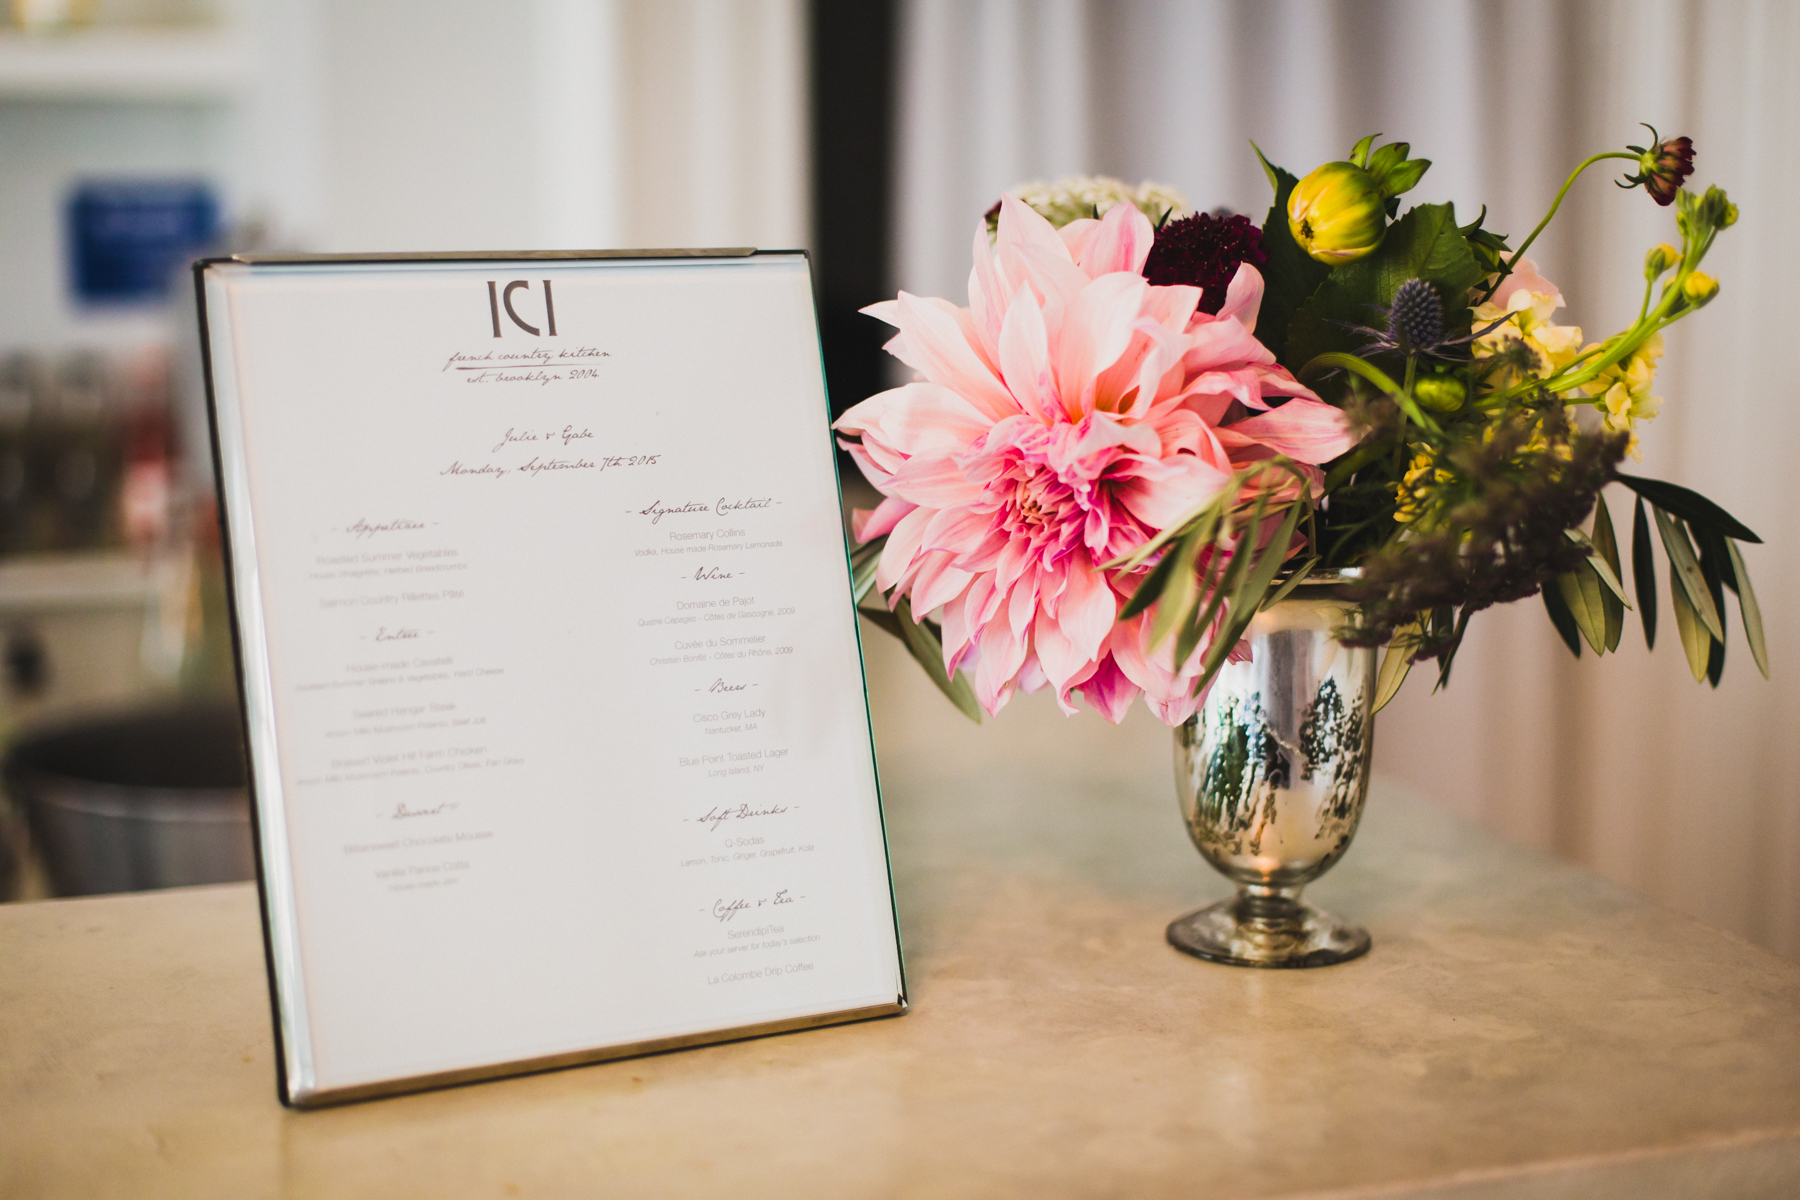 ICI-Restaurant-Fort-Greene-Brooklyn-Intimate-Documentary-Wedding-Photography-Elvira-Kalviste-17.jpg